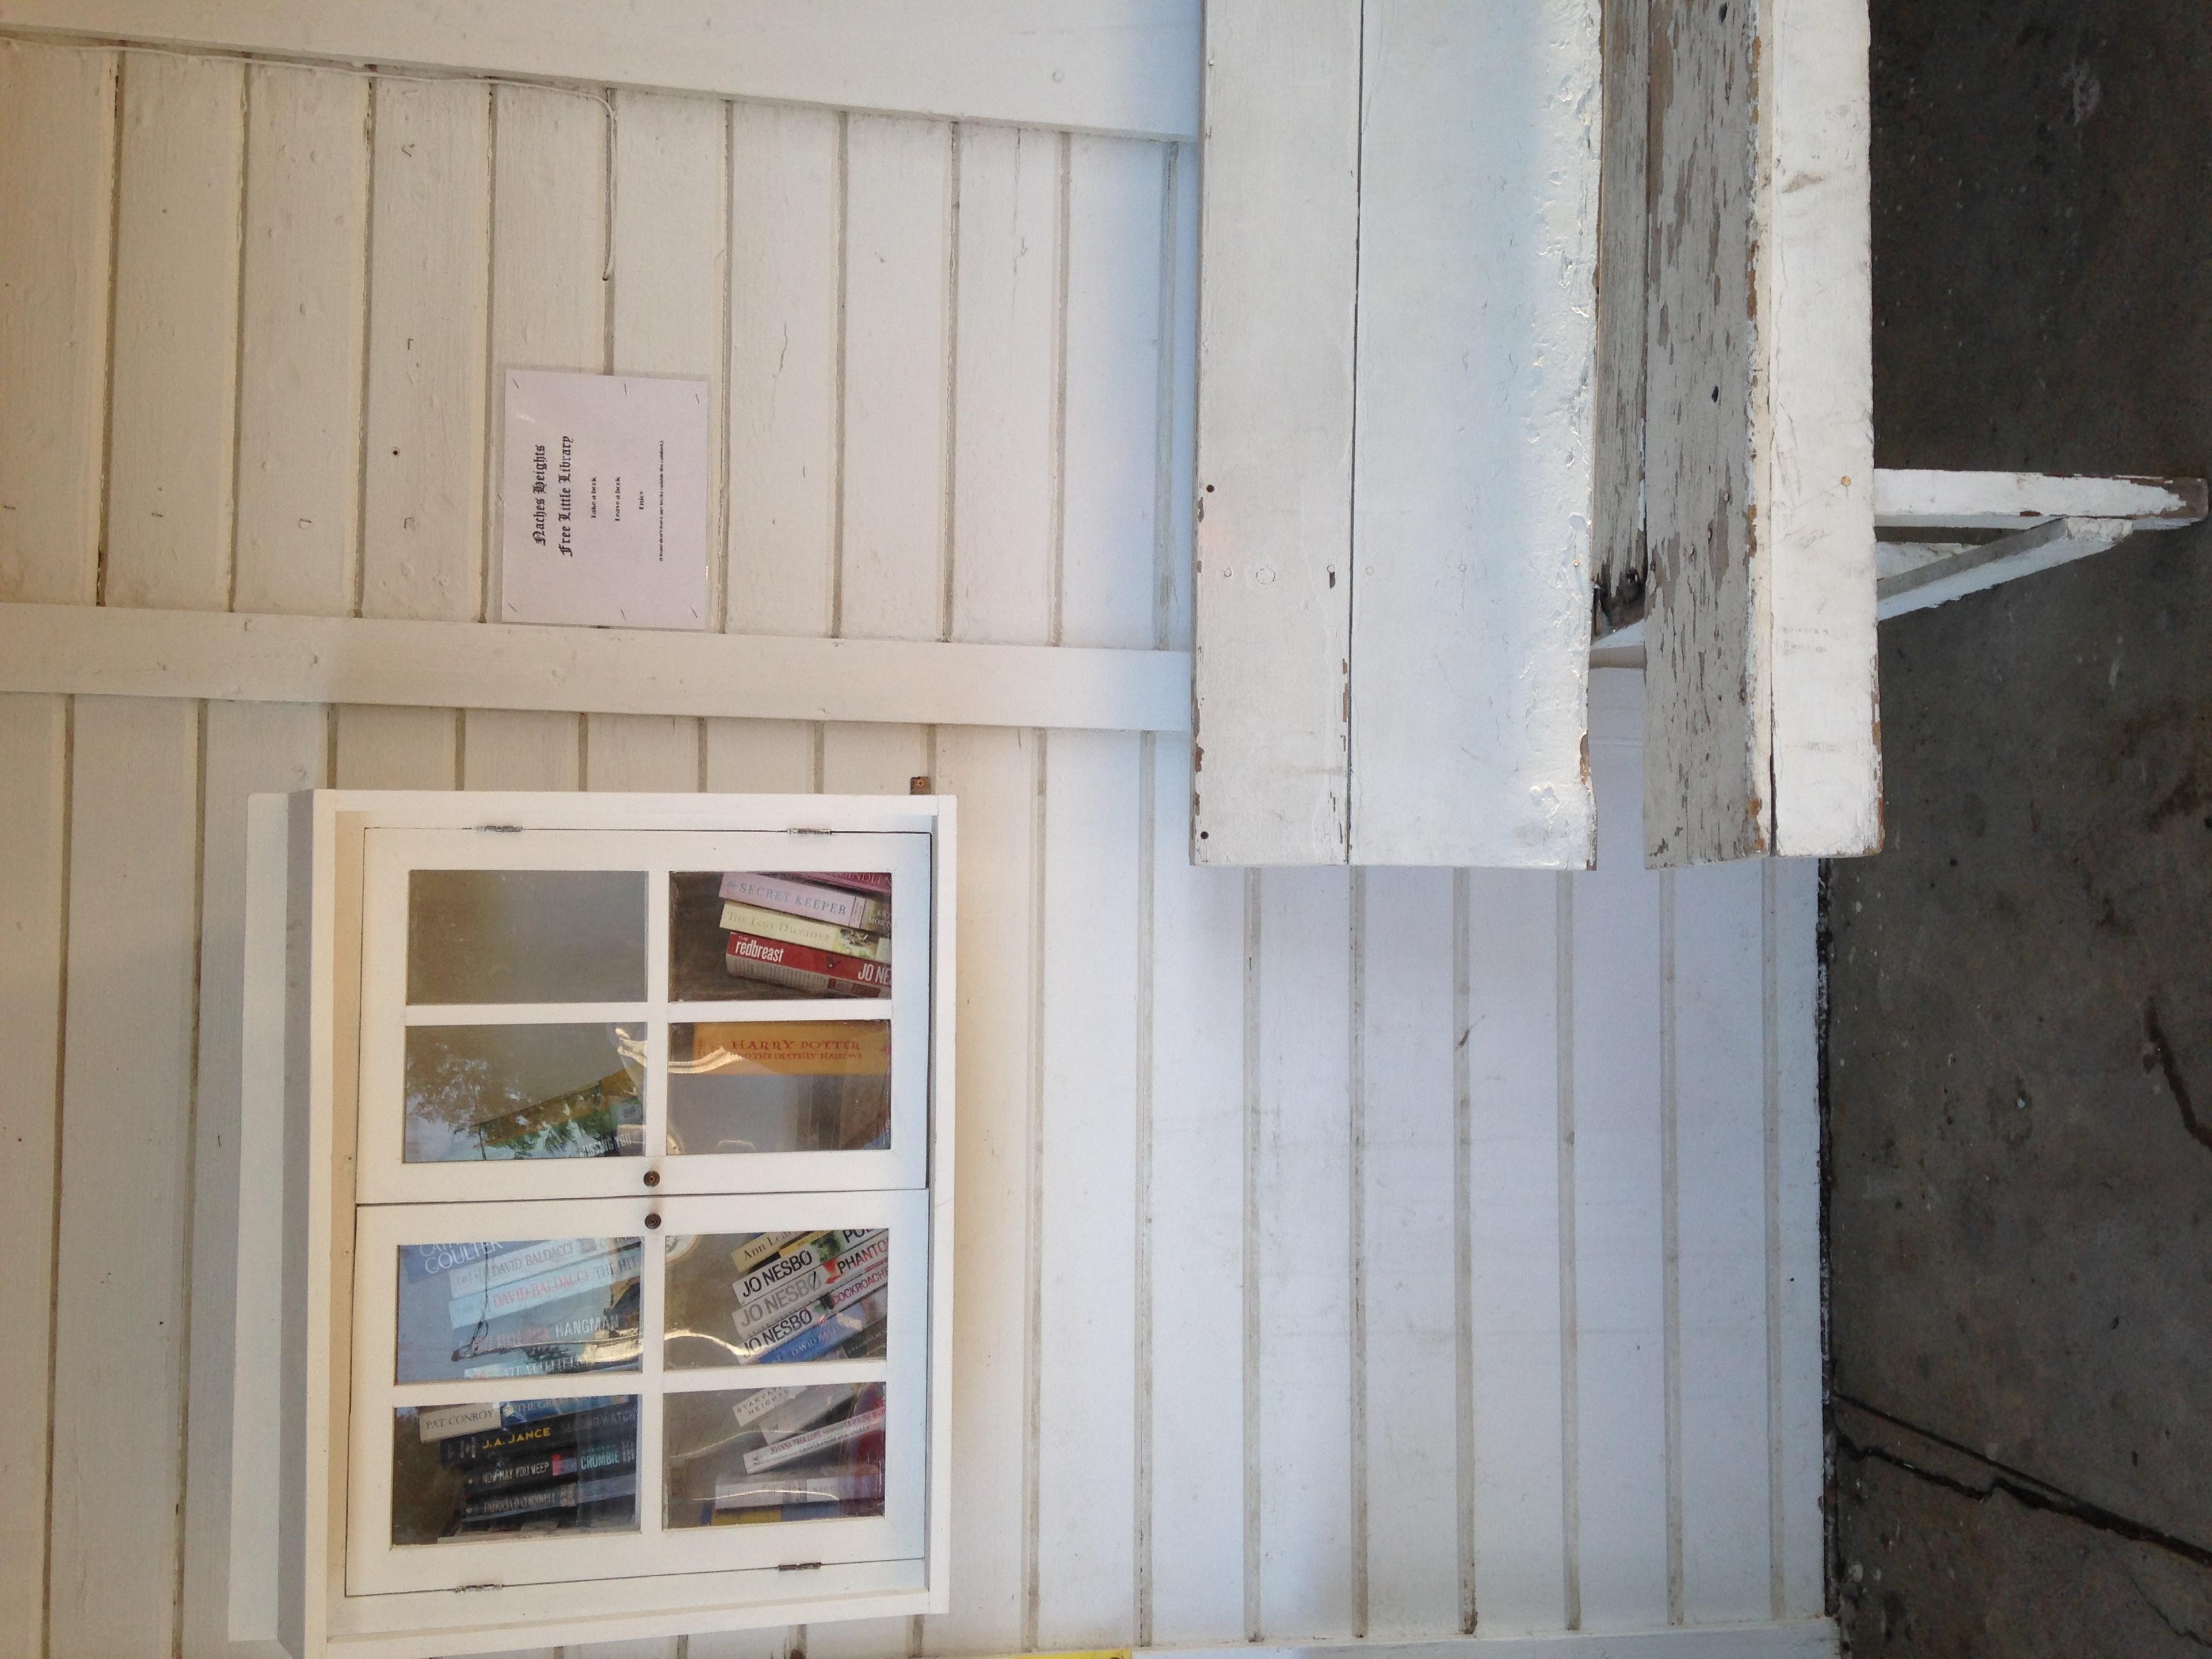 The Little Store lending library.